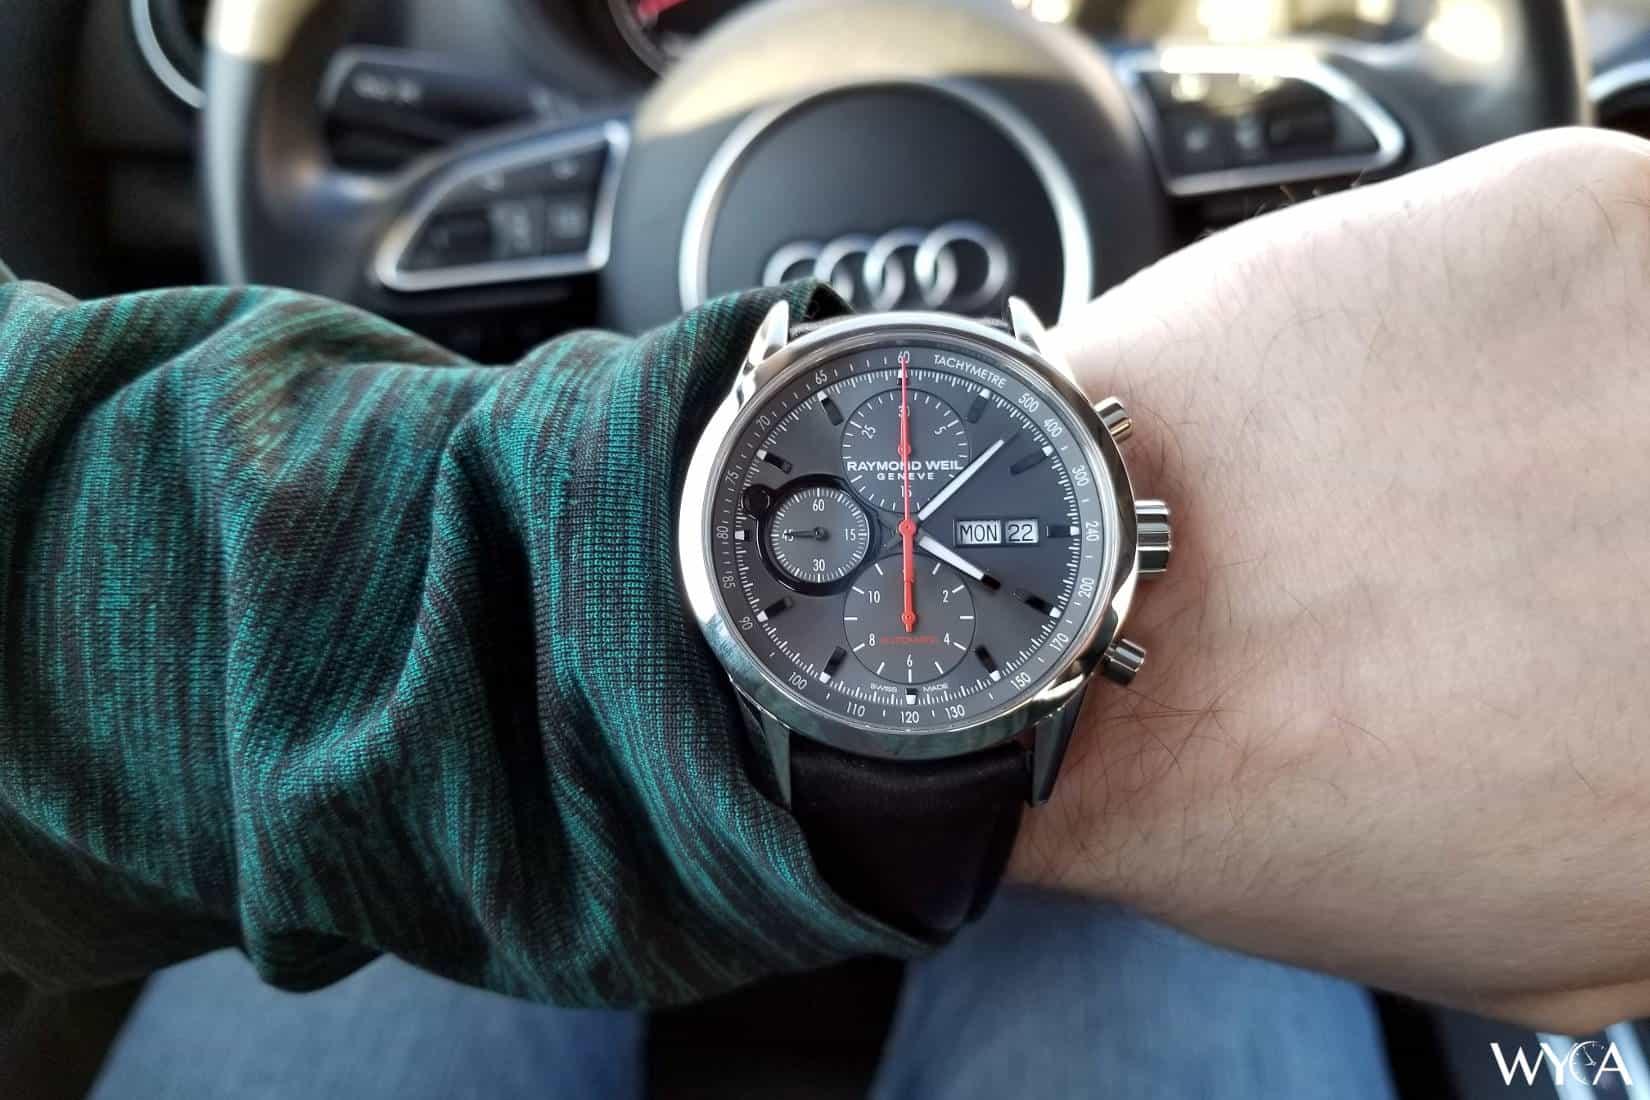 Raymond Weil Freelancer Chronograph Wrist Shot